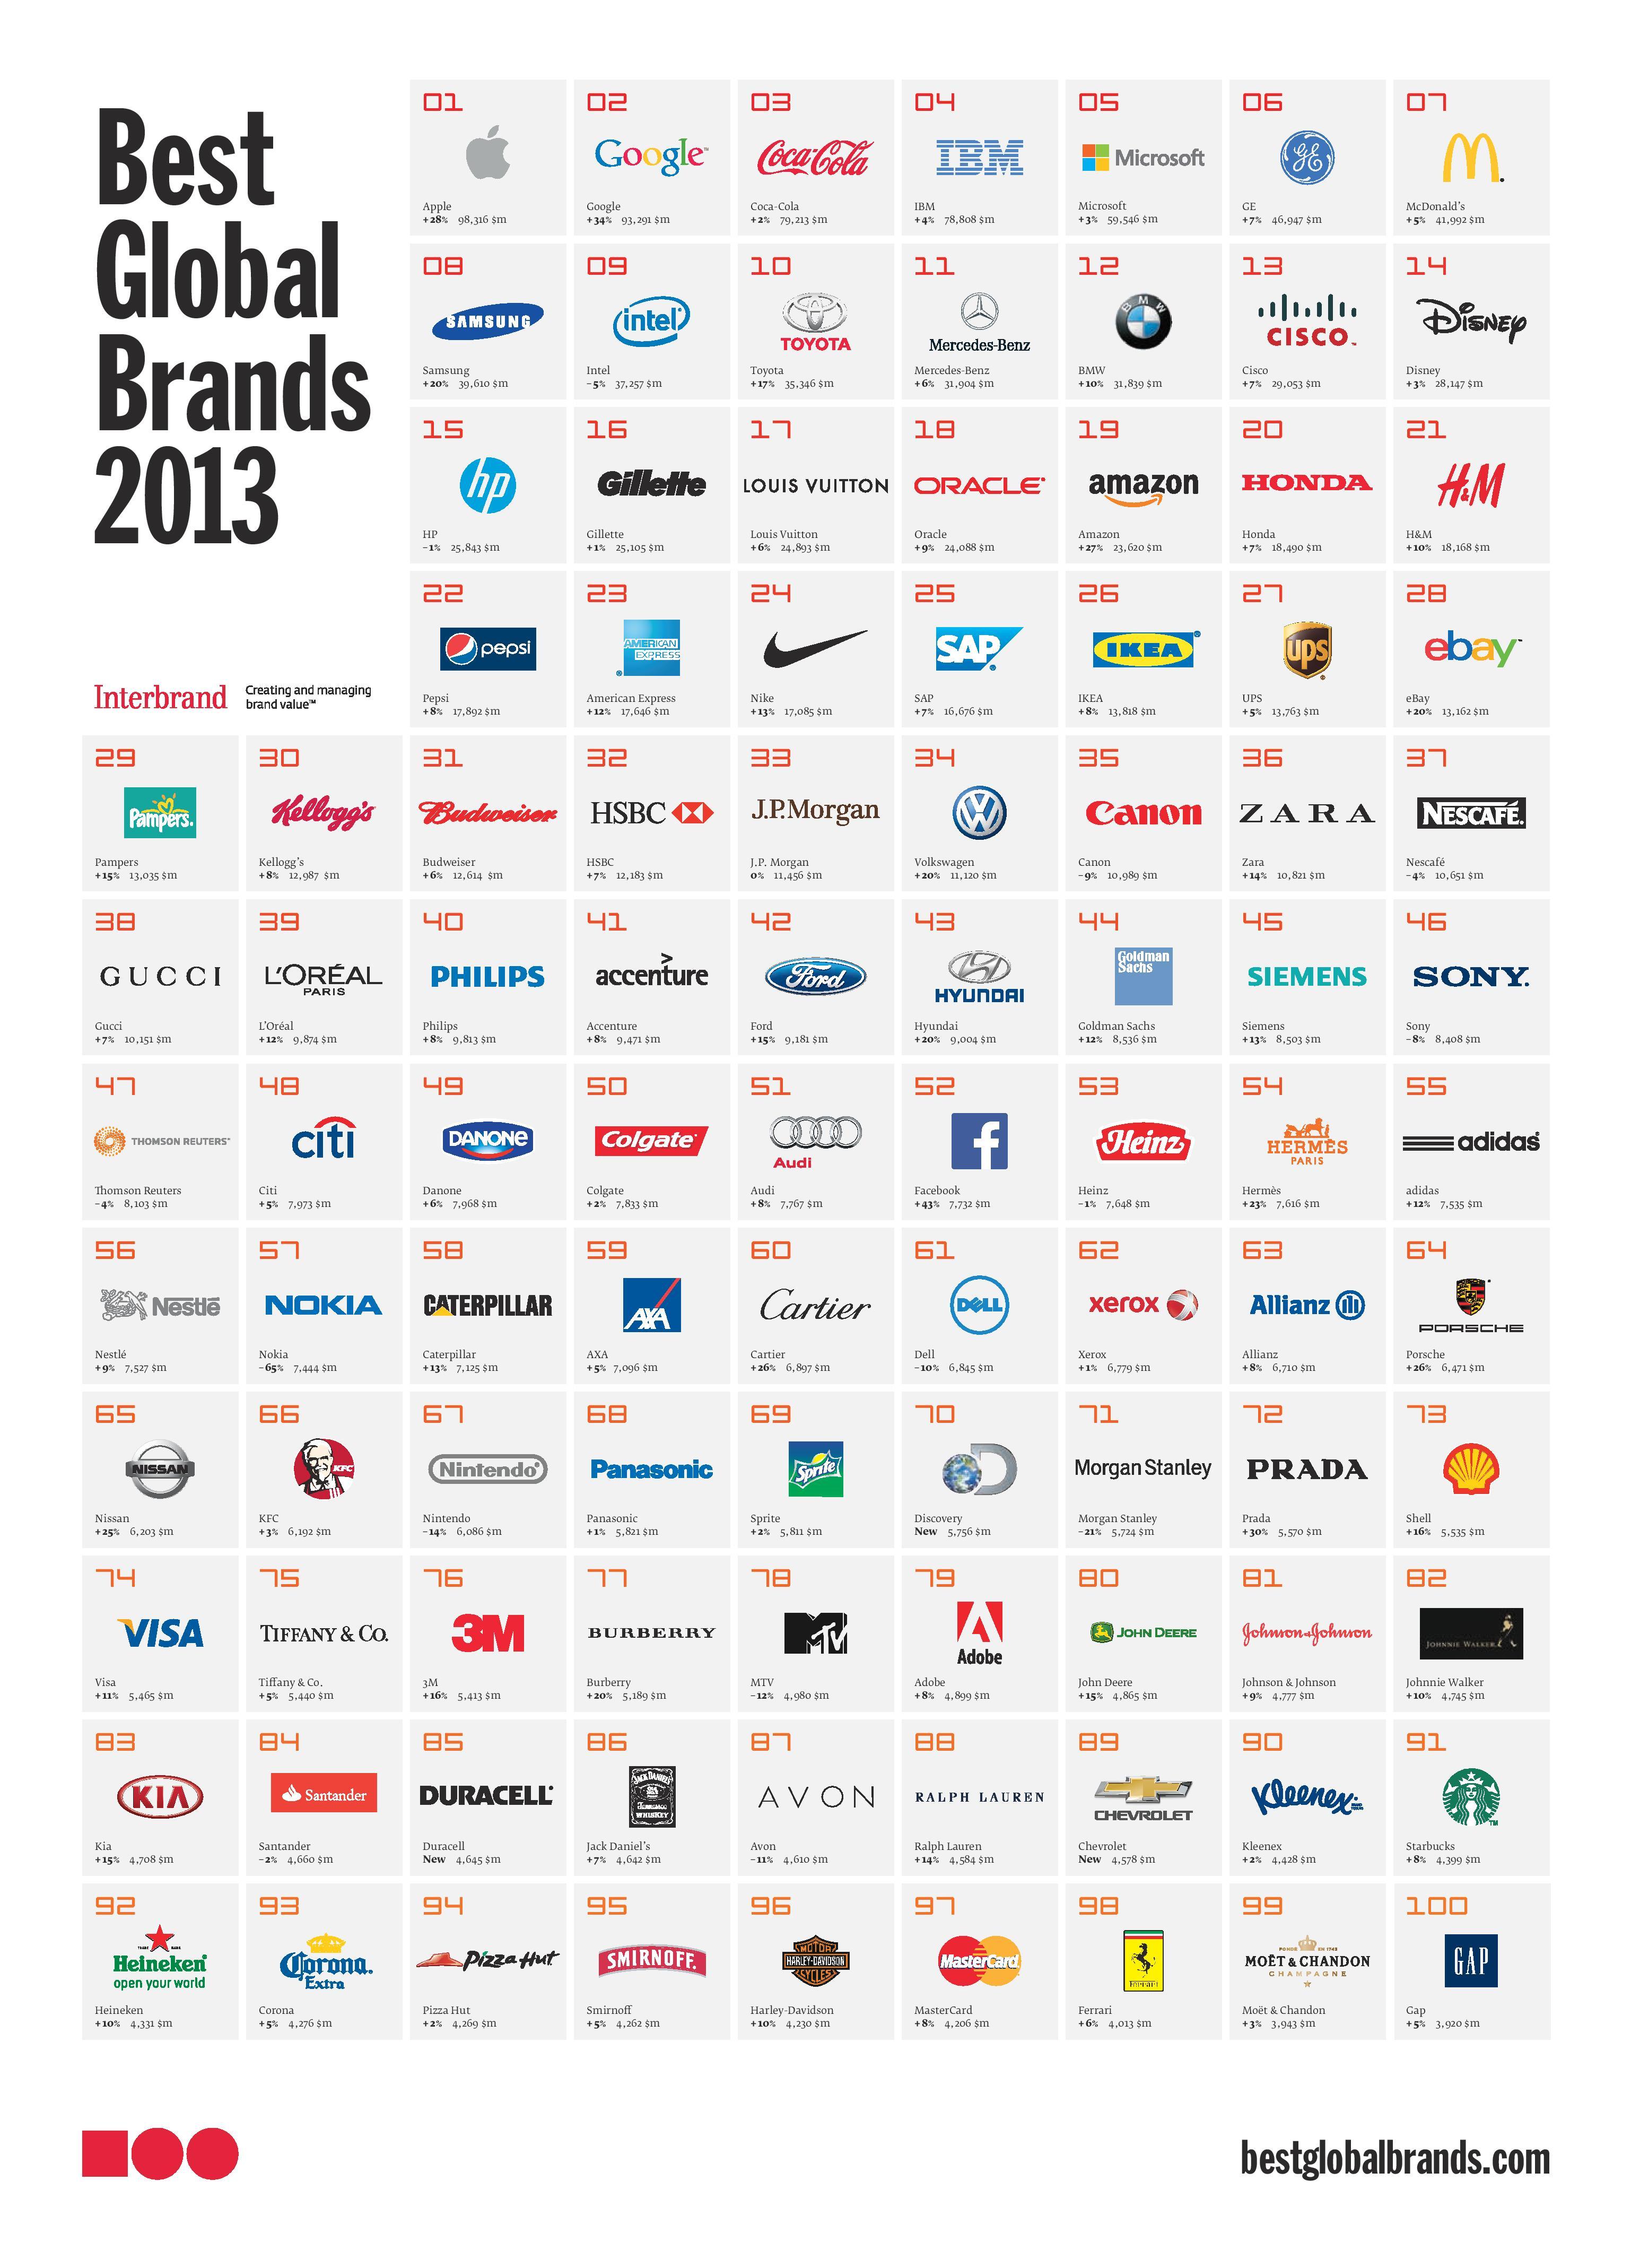 Best Global Brands 2013 Poster